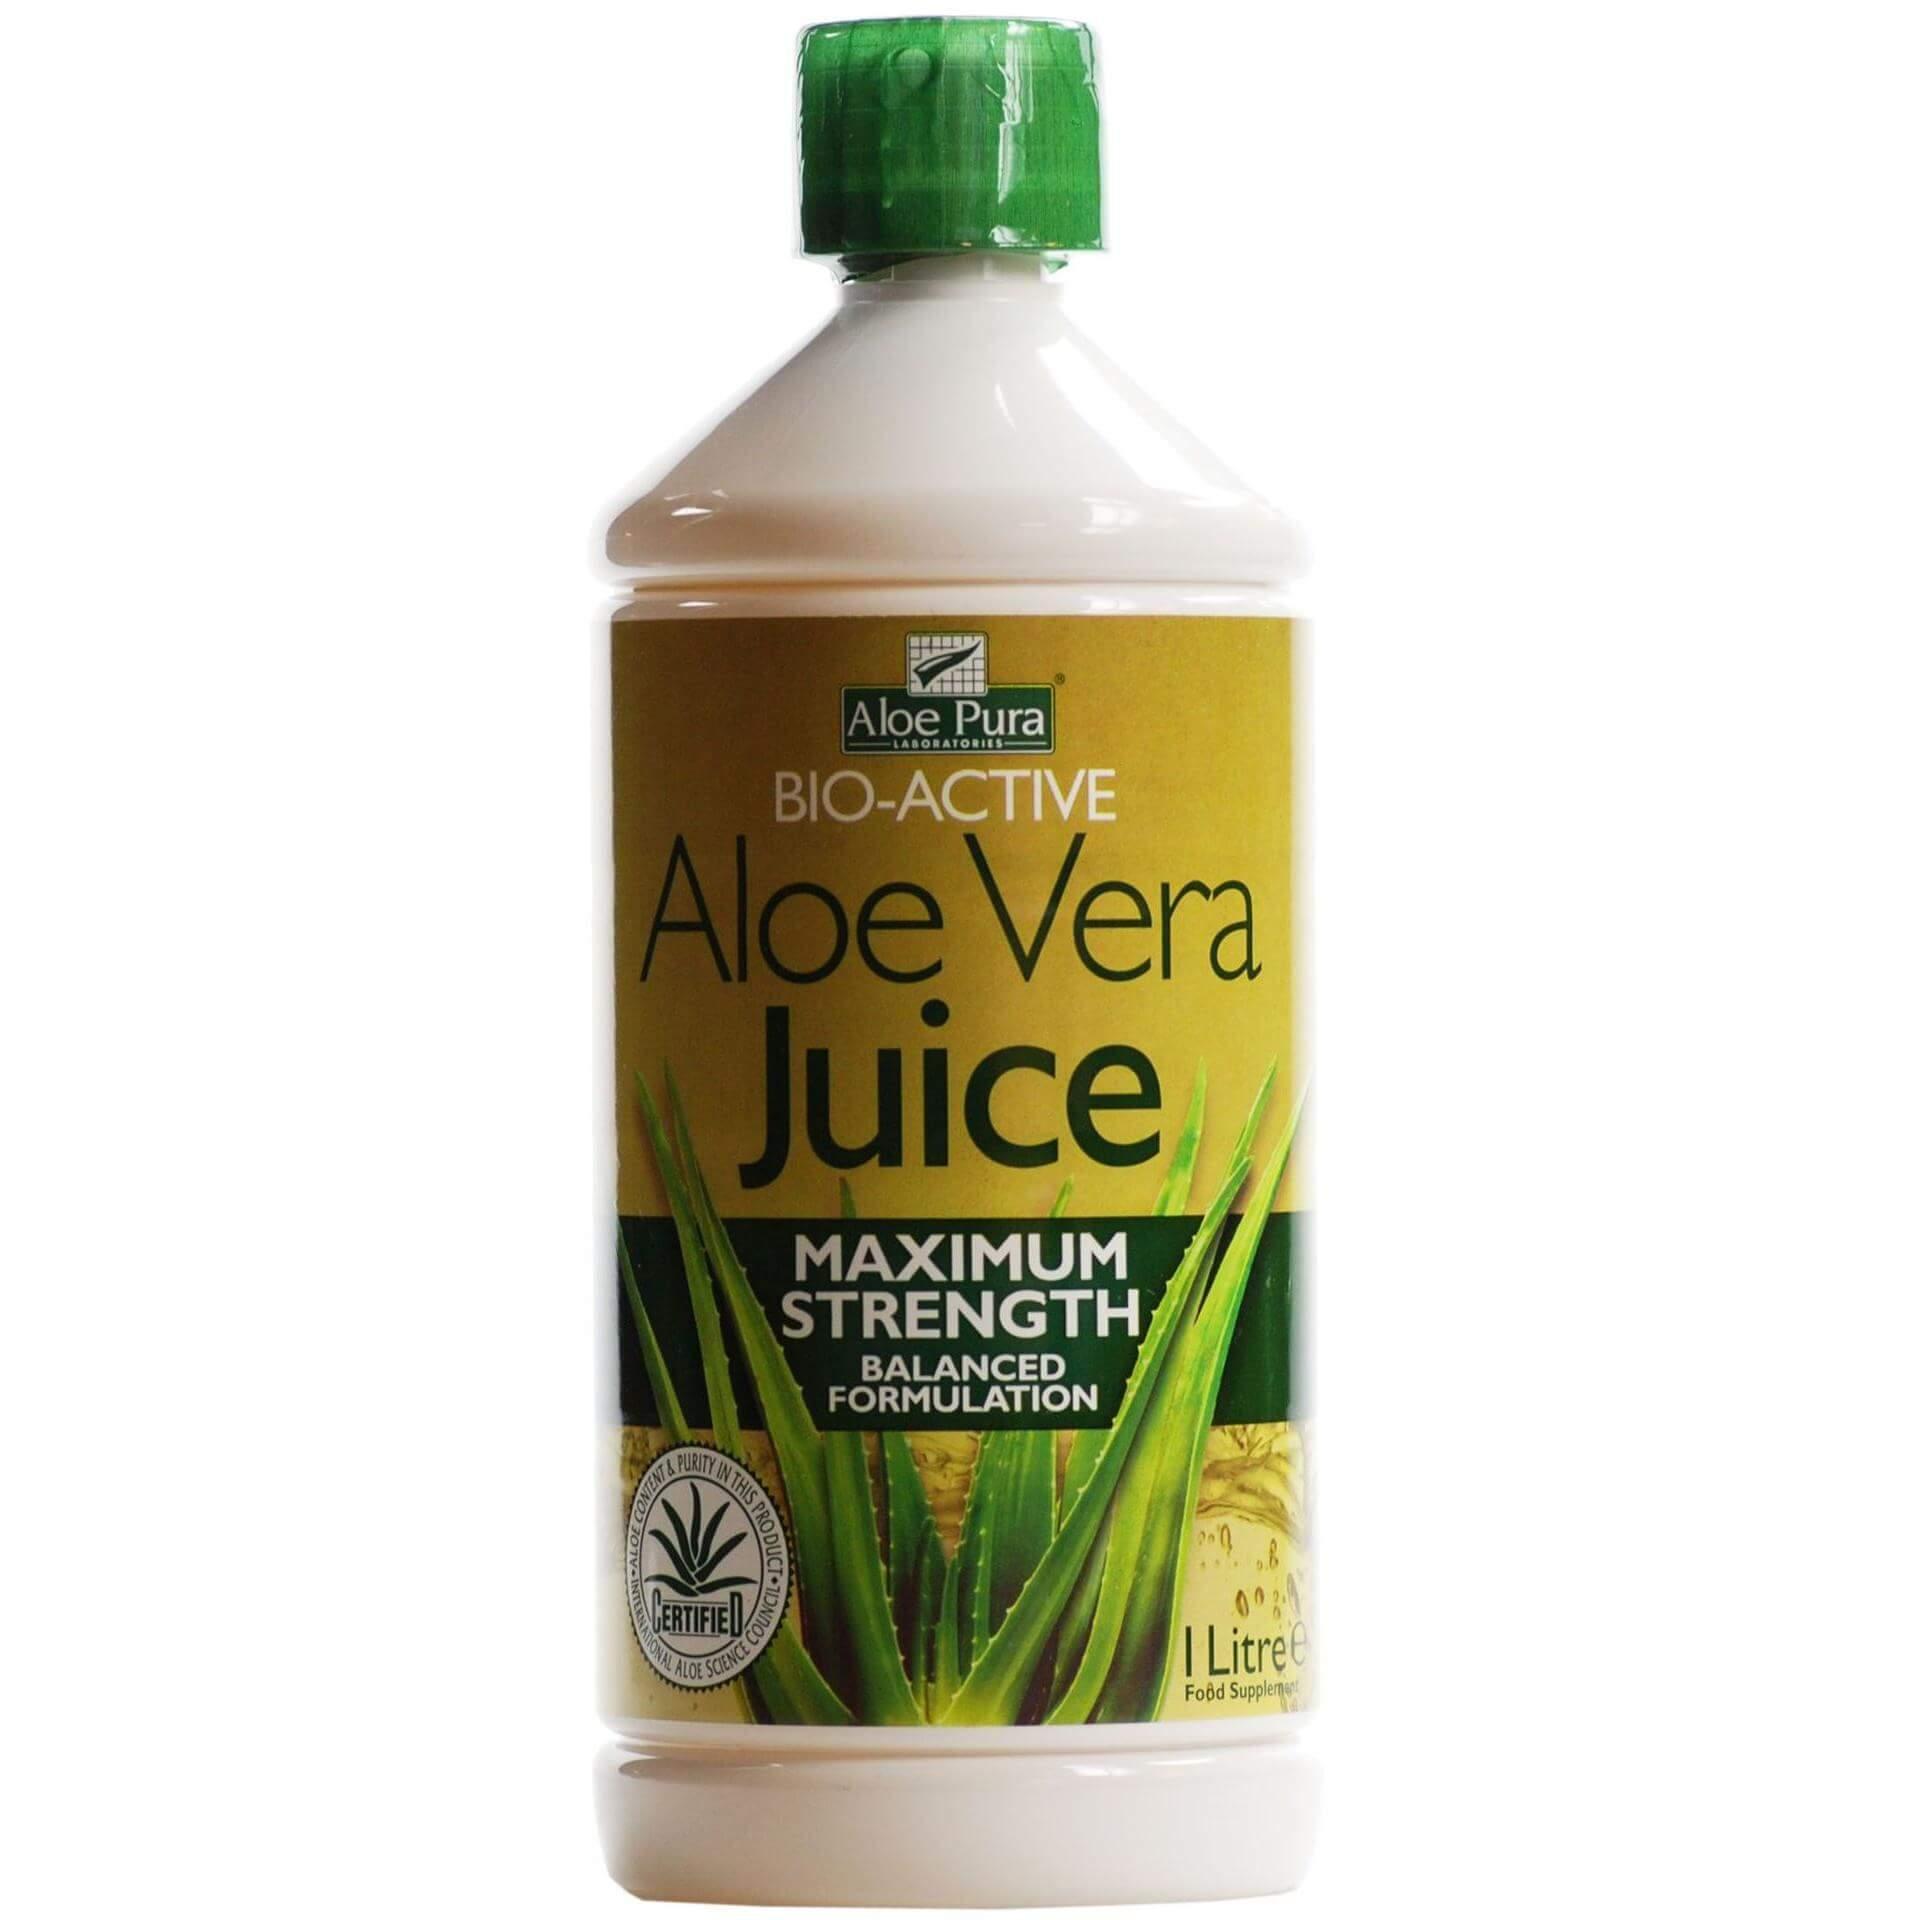 Optima Aloe Vera Juice Maximum Strength 100% Φυσικός Χυμός Αλόης 1L